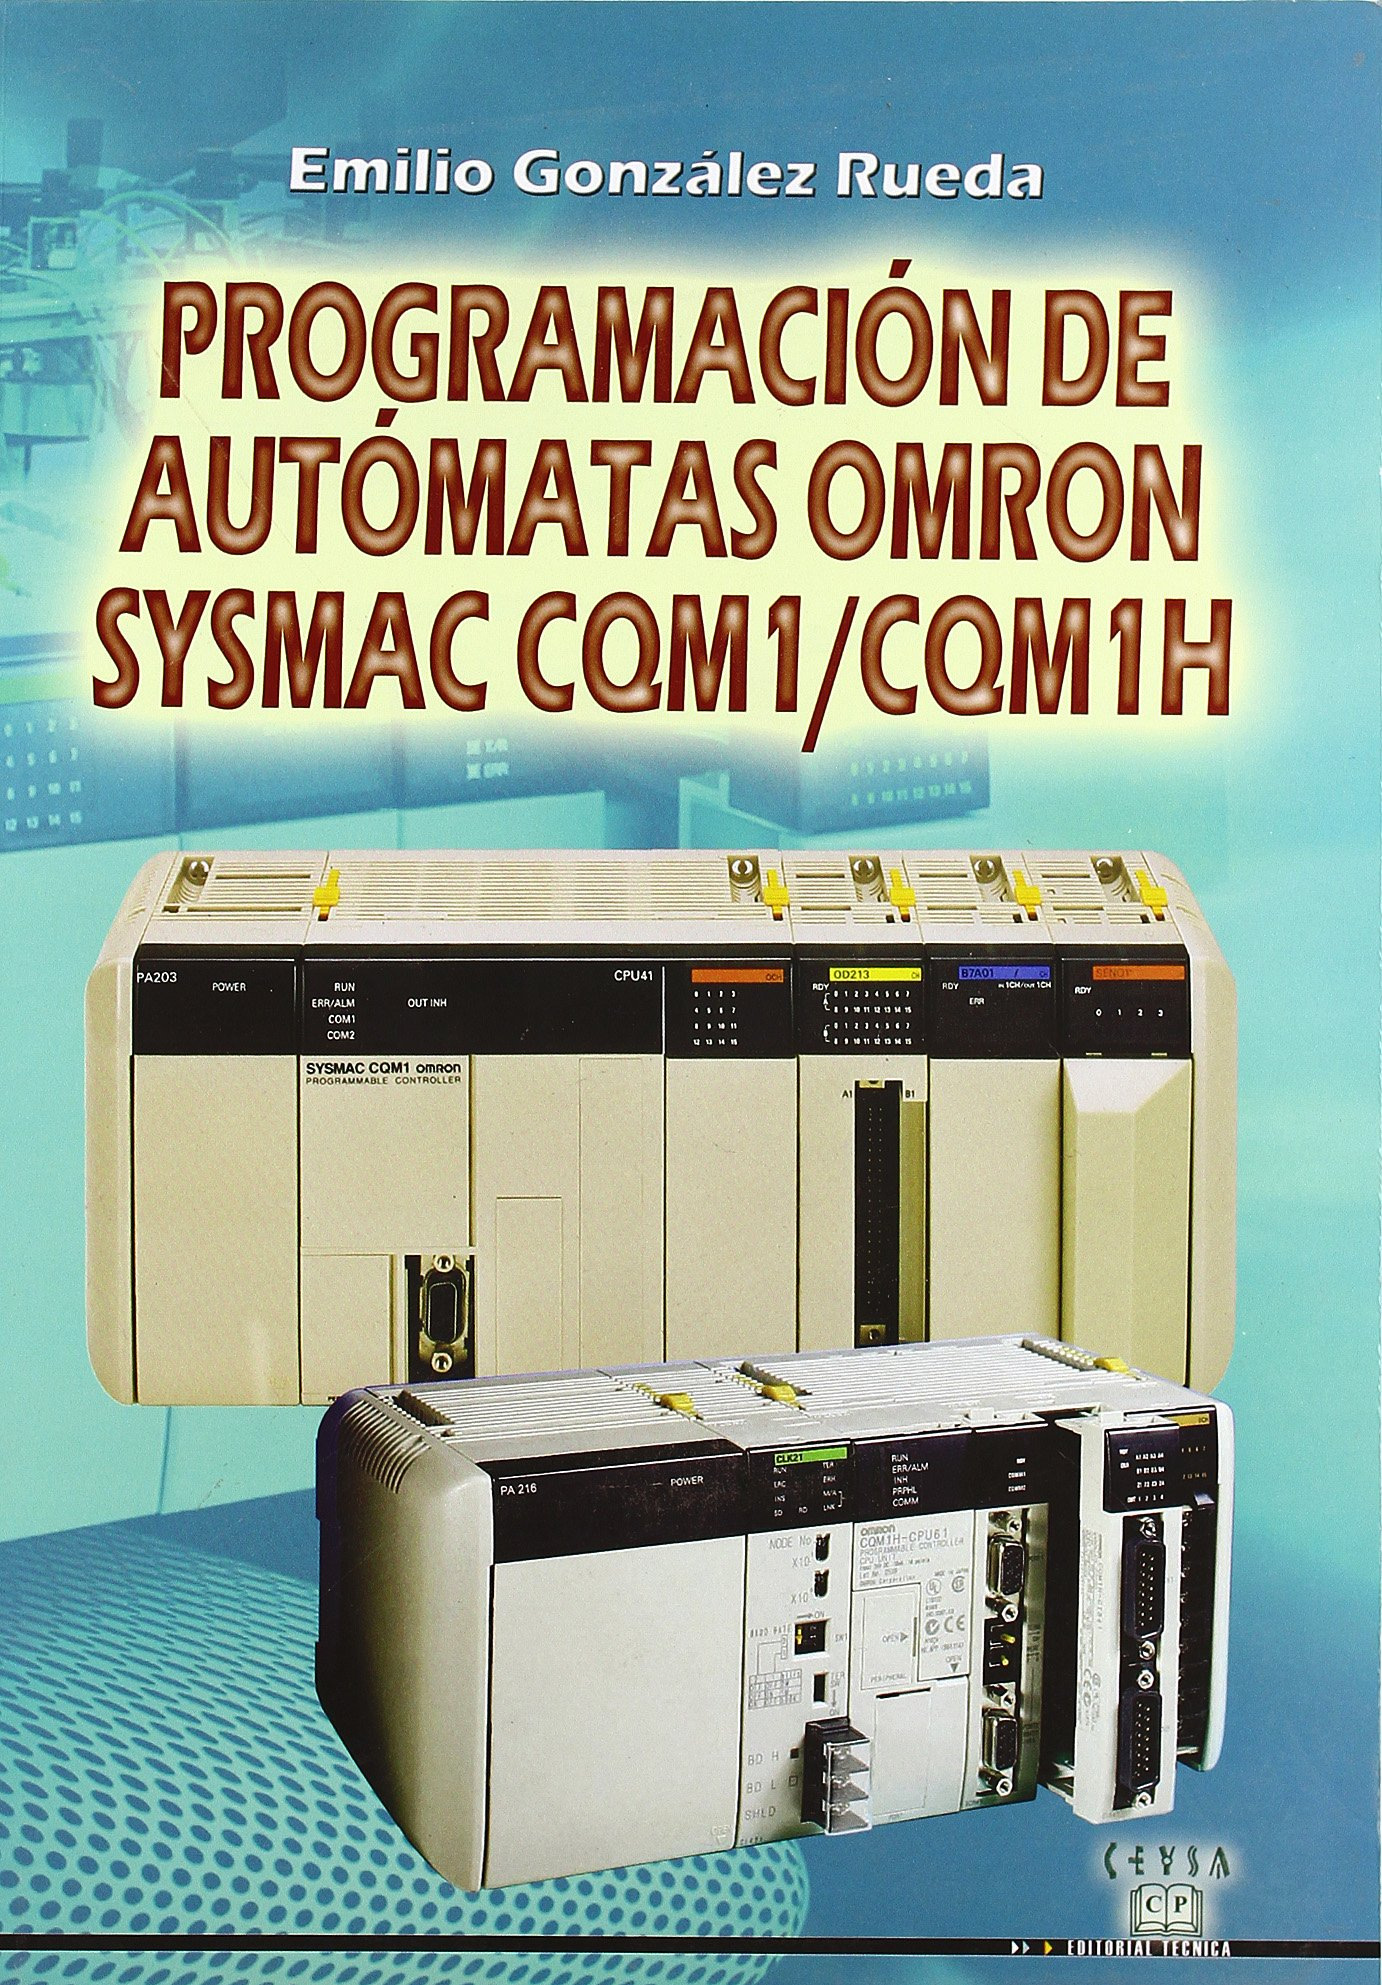 Gs - programacion de automatas omron sysmac cqm1/cqm1h Tapa blanda – 18 mar 2009 Emilio Gonzalez Rueda Ediciones Ceysa 8486108705 Computación E InformÁtica